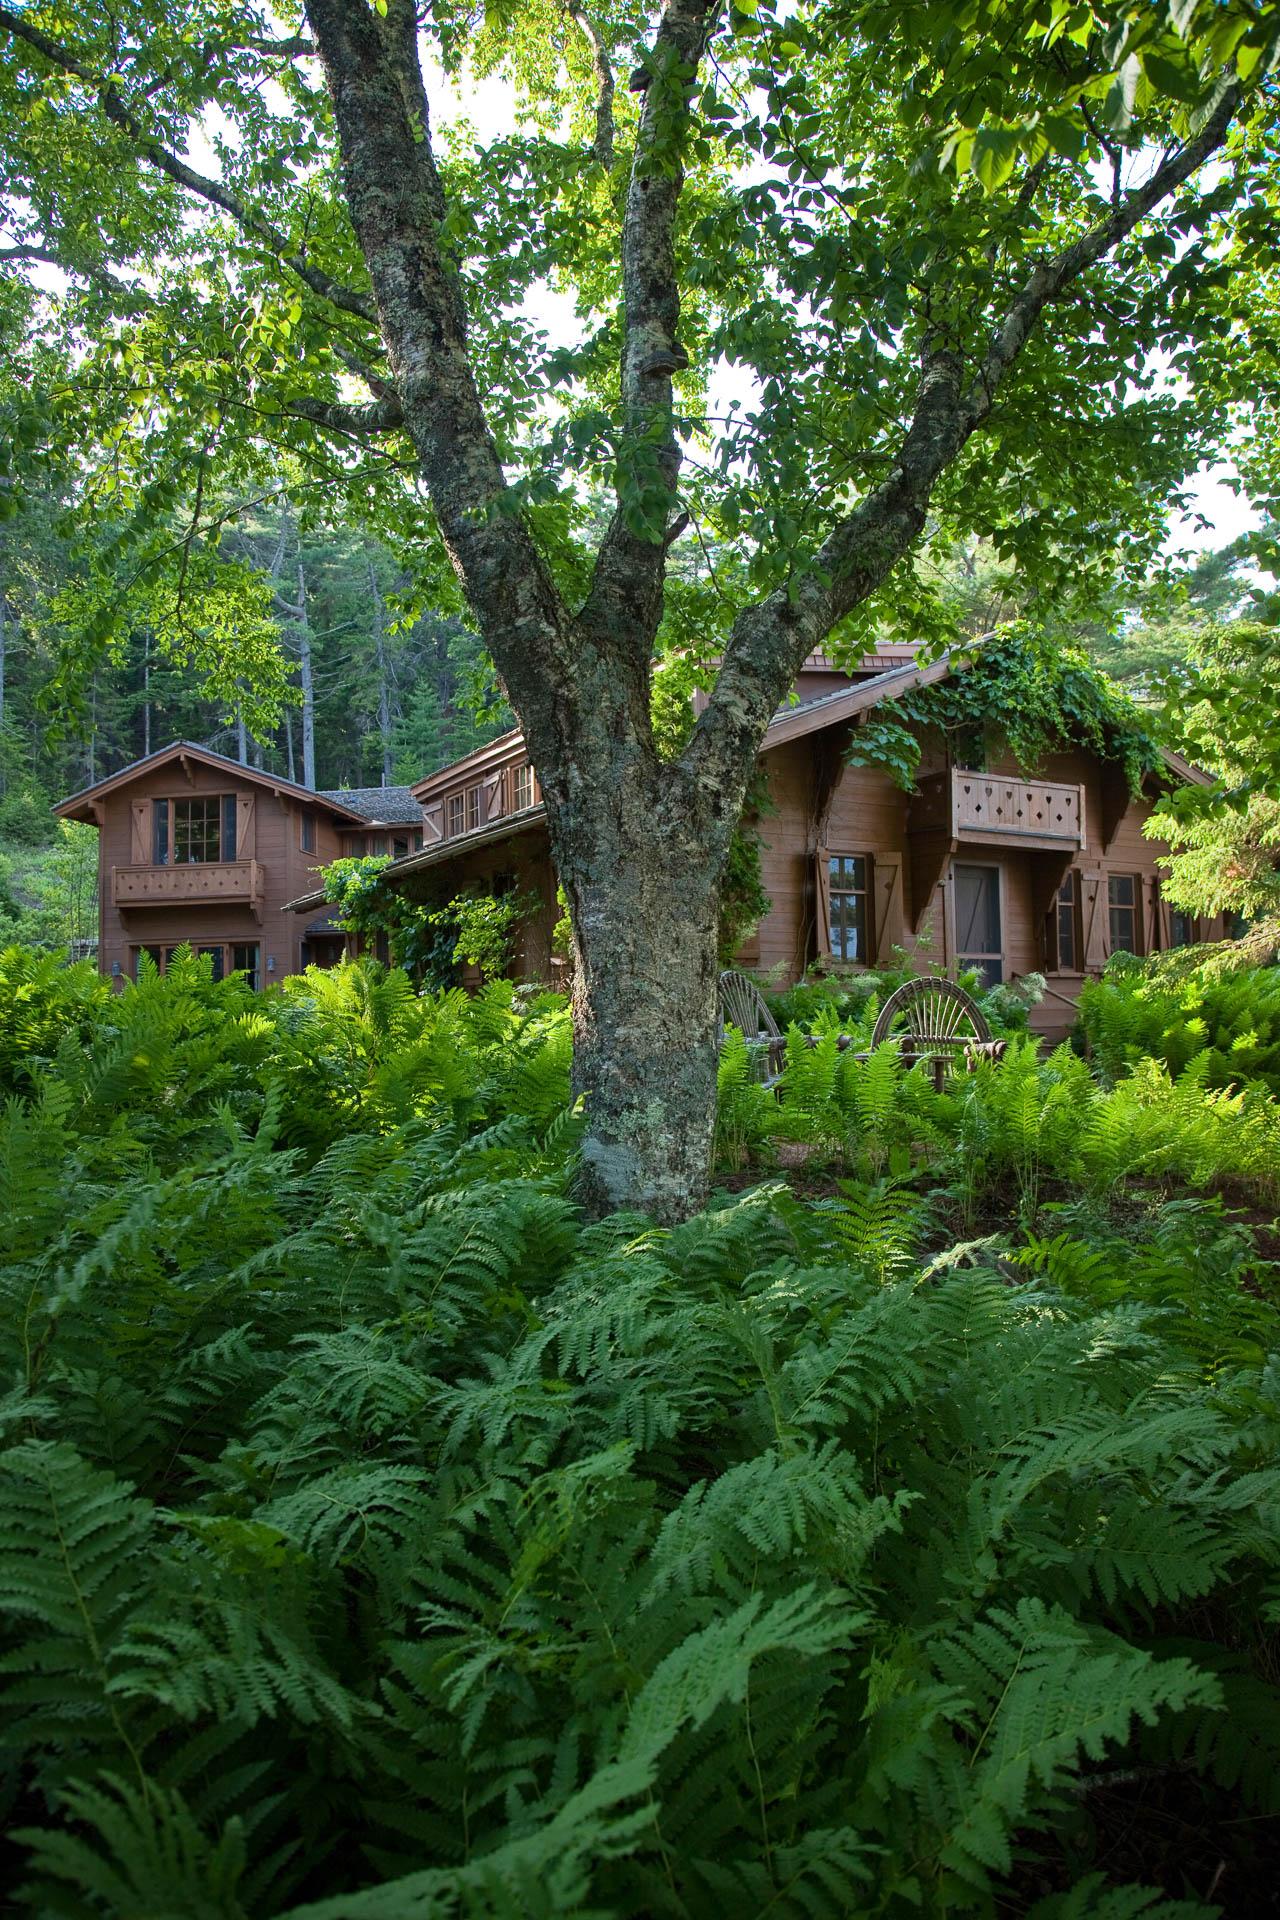 Le petit chalet matthew cunningham landscape design llc for Garden design llc